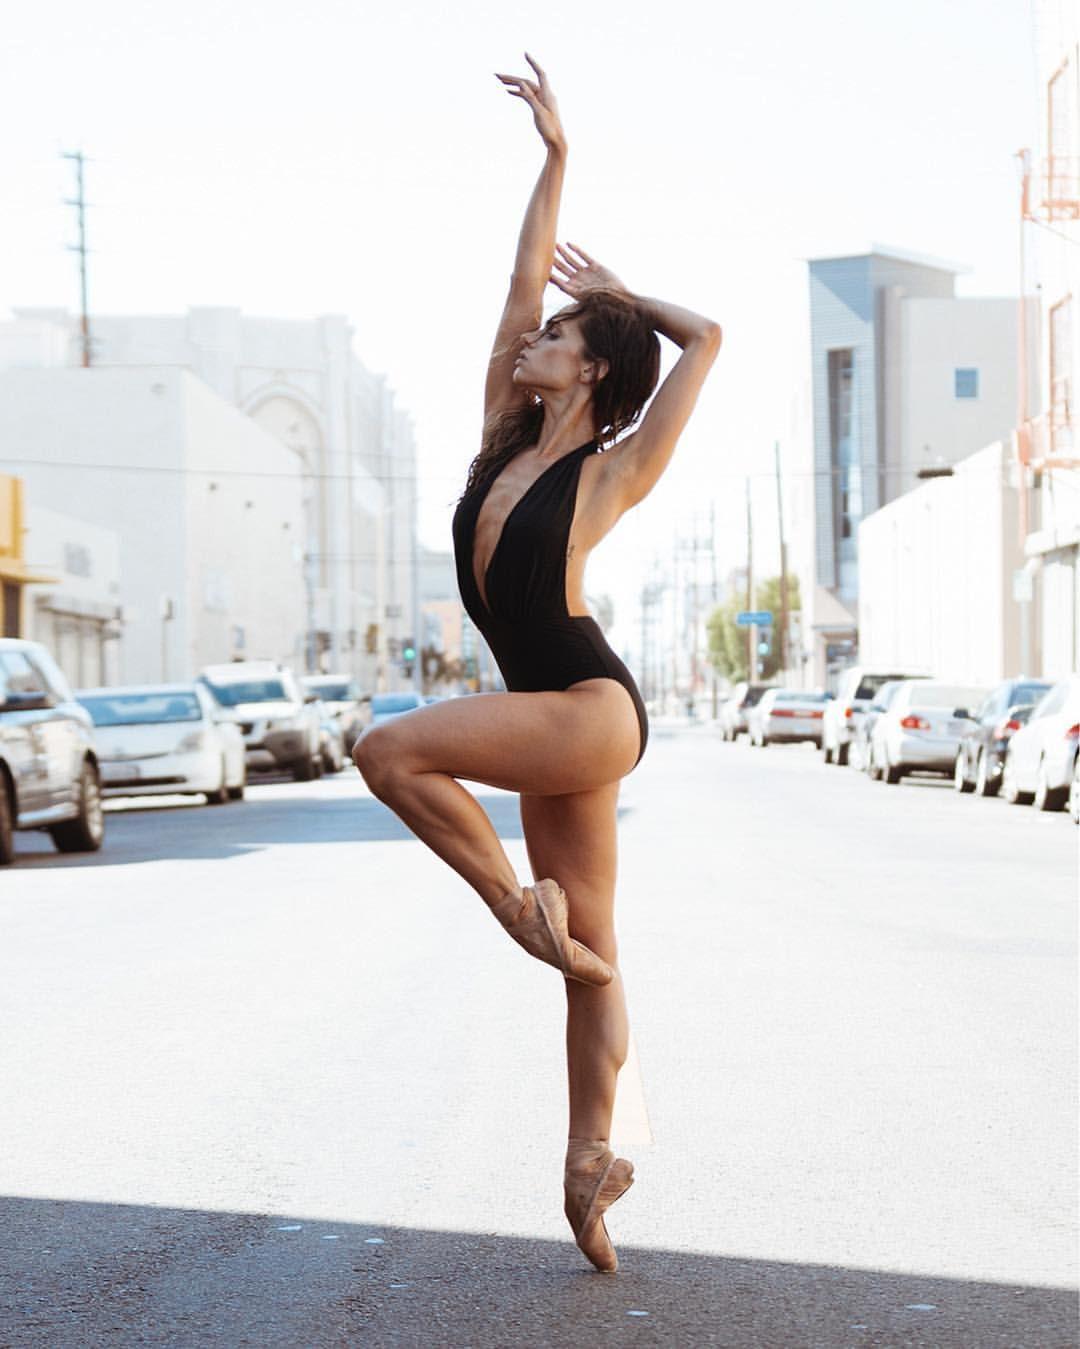 Mary Helen Bowers, fitness model